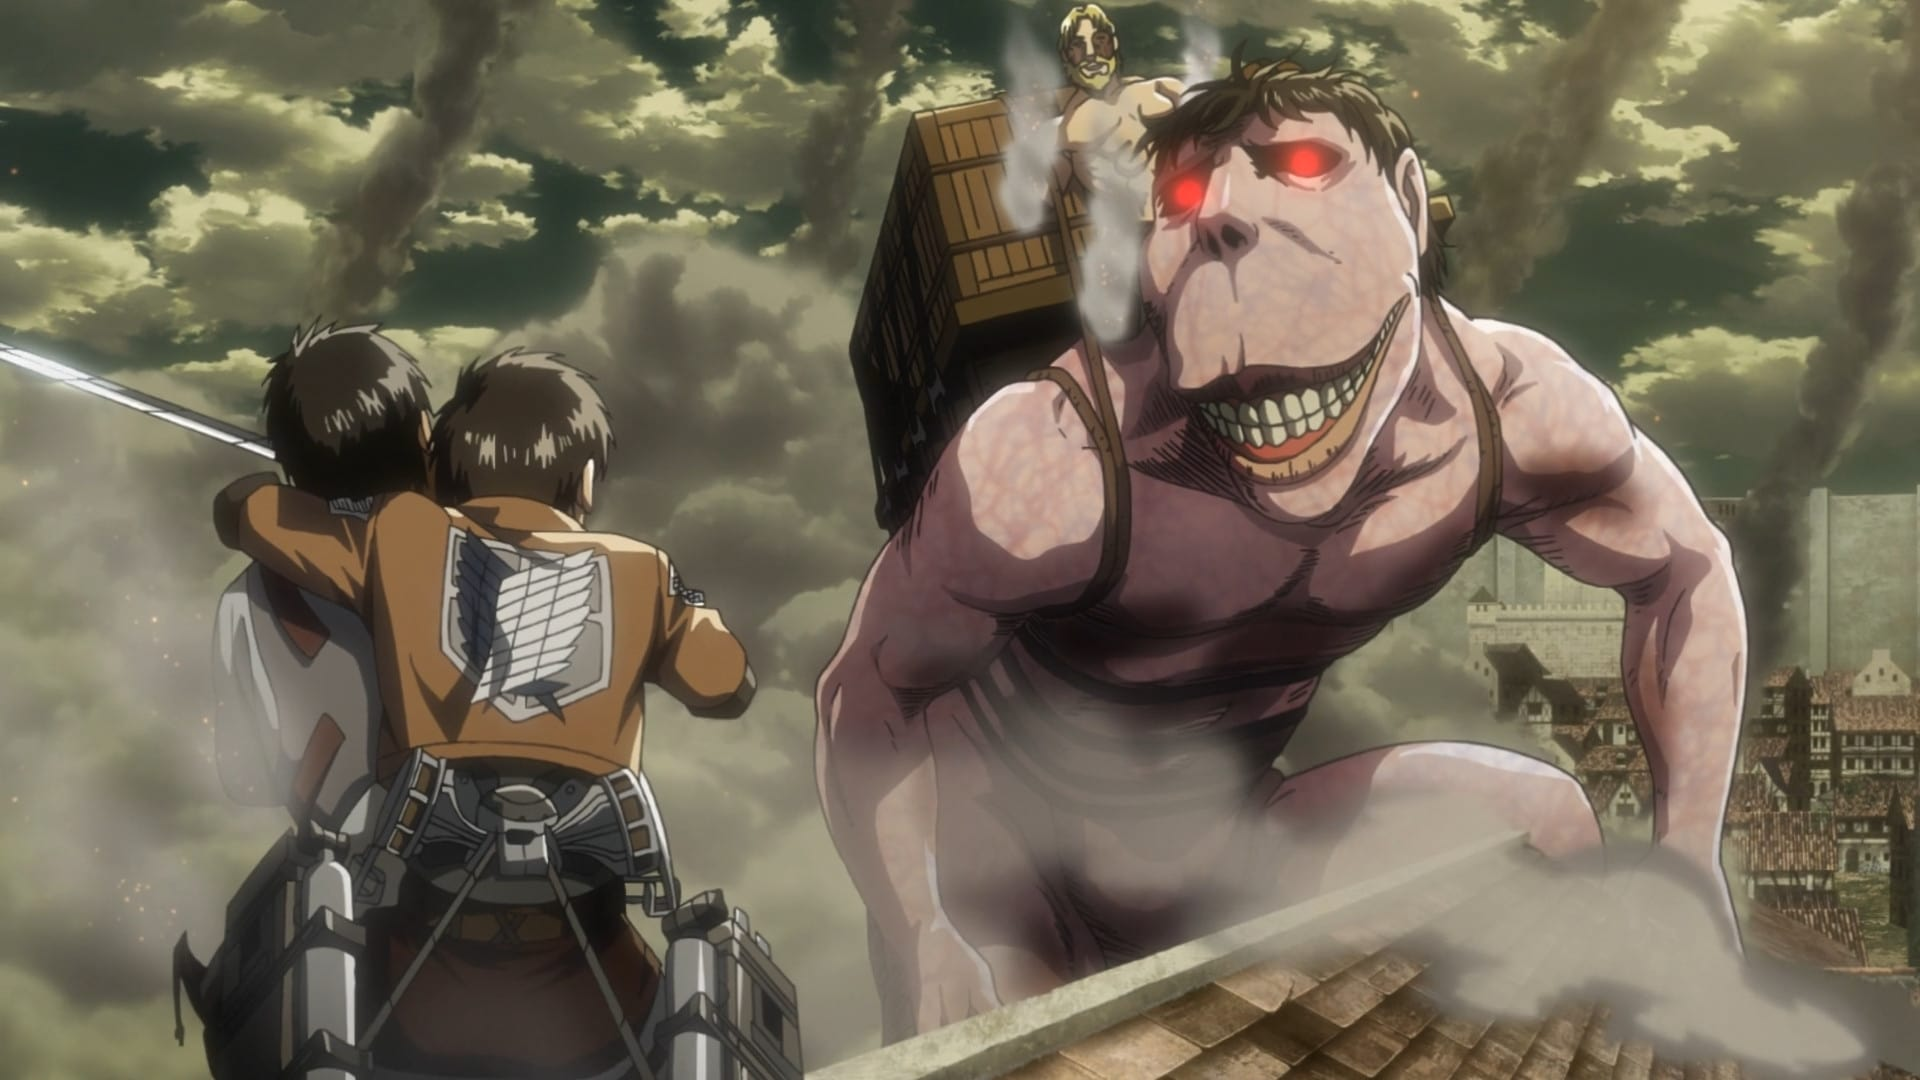 Shingeki No Kyojin Attack On Titan 3x18 187 Anime Online Sub